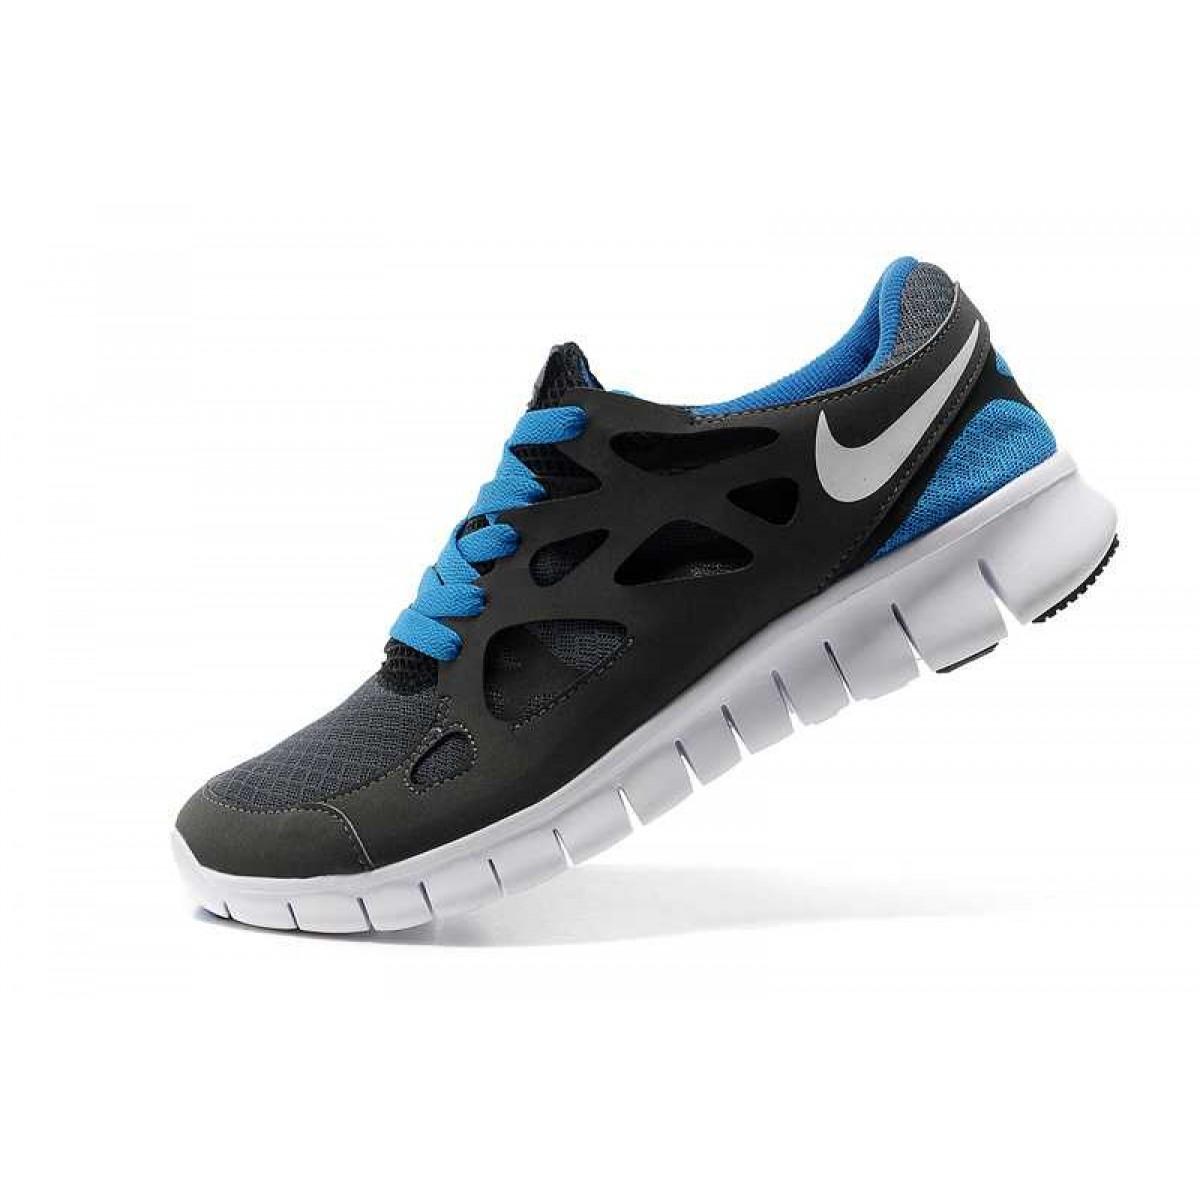 size 40 5ab15 90f7a Nike Free Run 2 Homme Chaussures Noir Bleu,nike free run 2,grande surprise